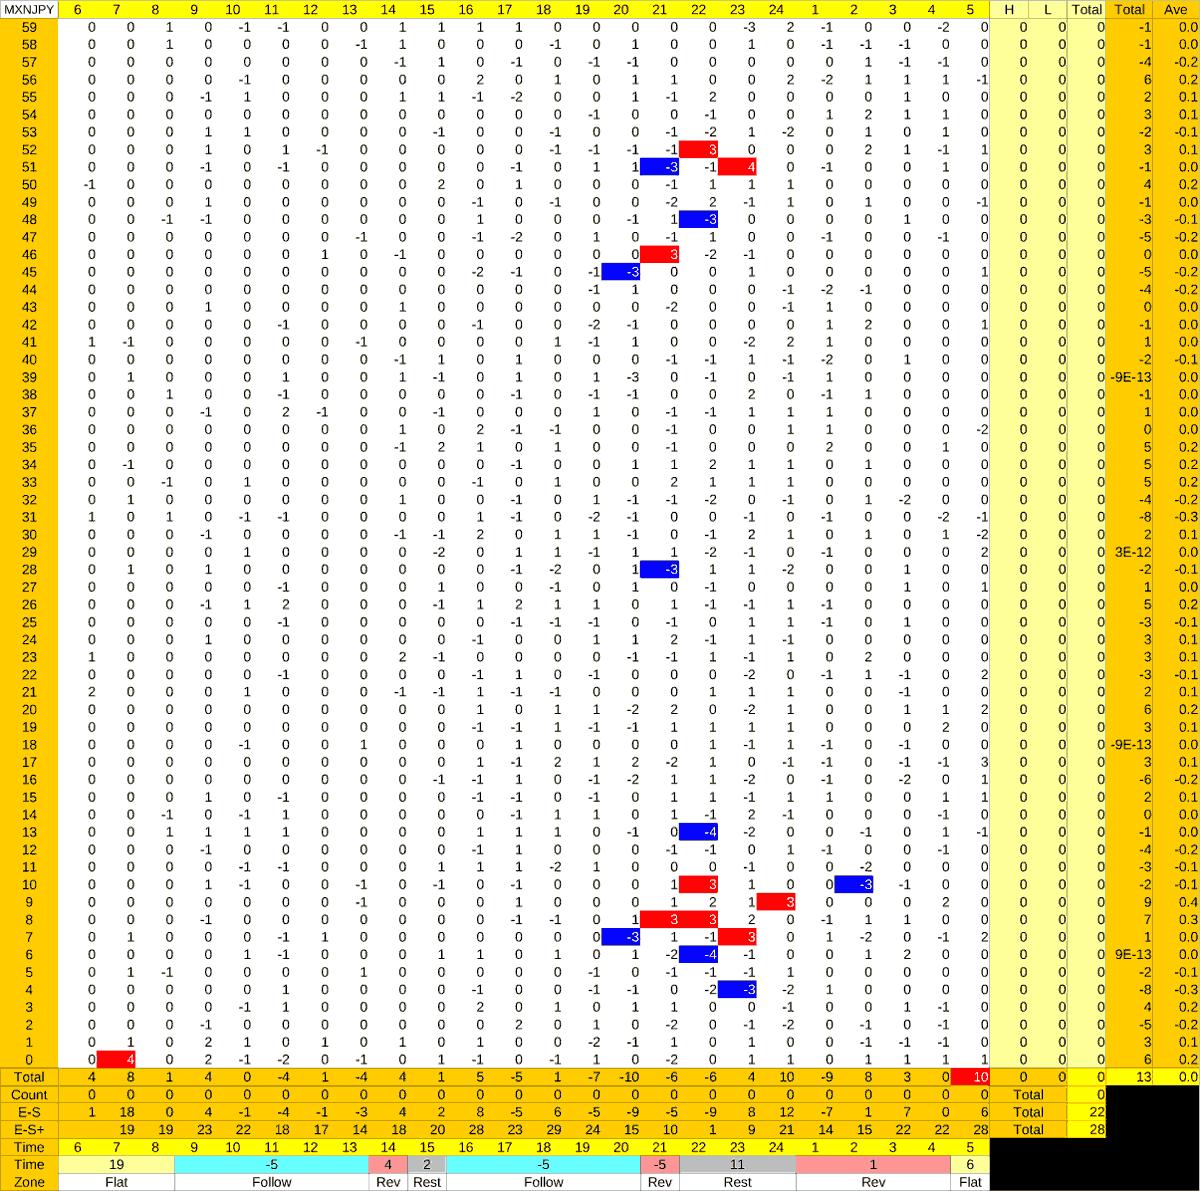 20210825_HS(3)MXNJPY